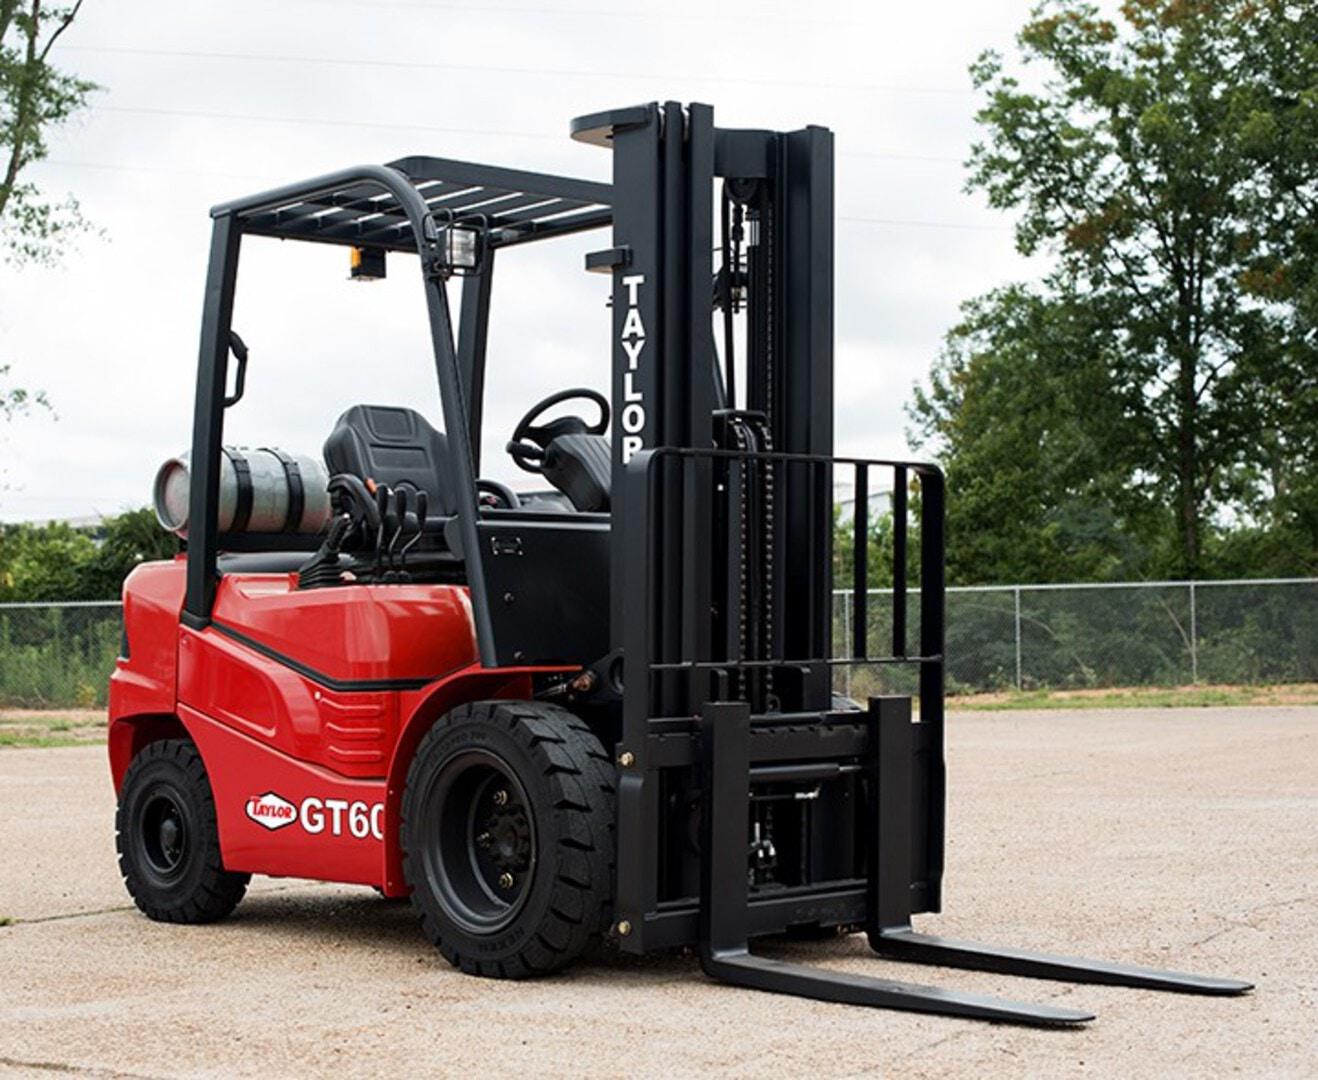 New, 2022, Taylor, GT-60  (4 valve) LP, Forklifts / Lift Trucks